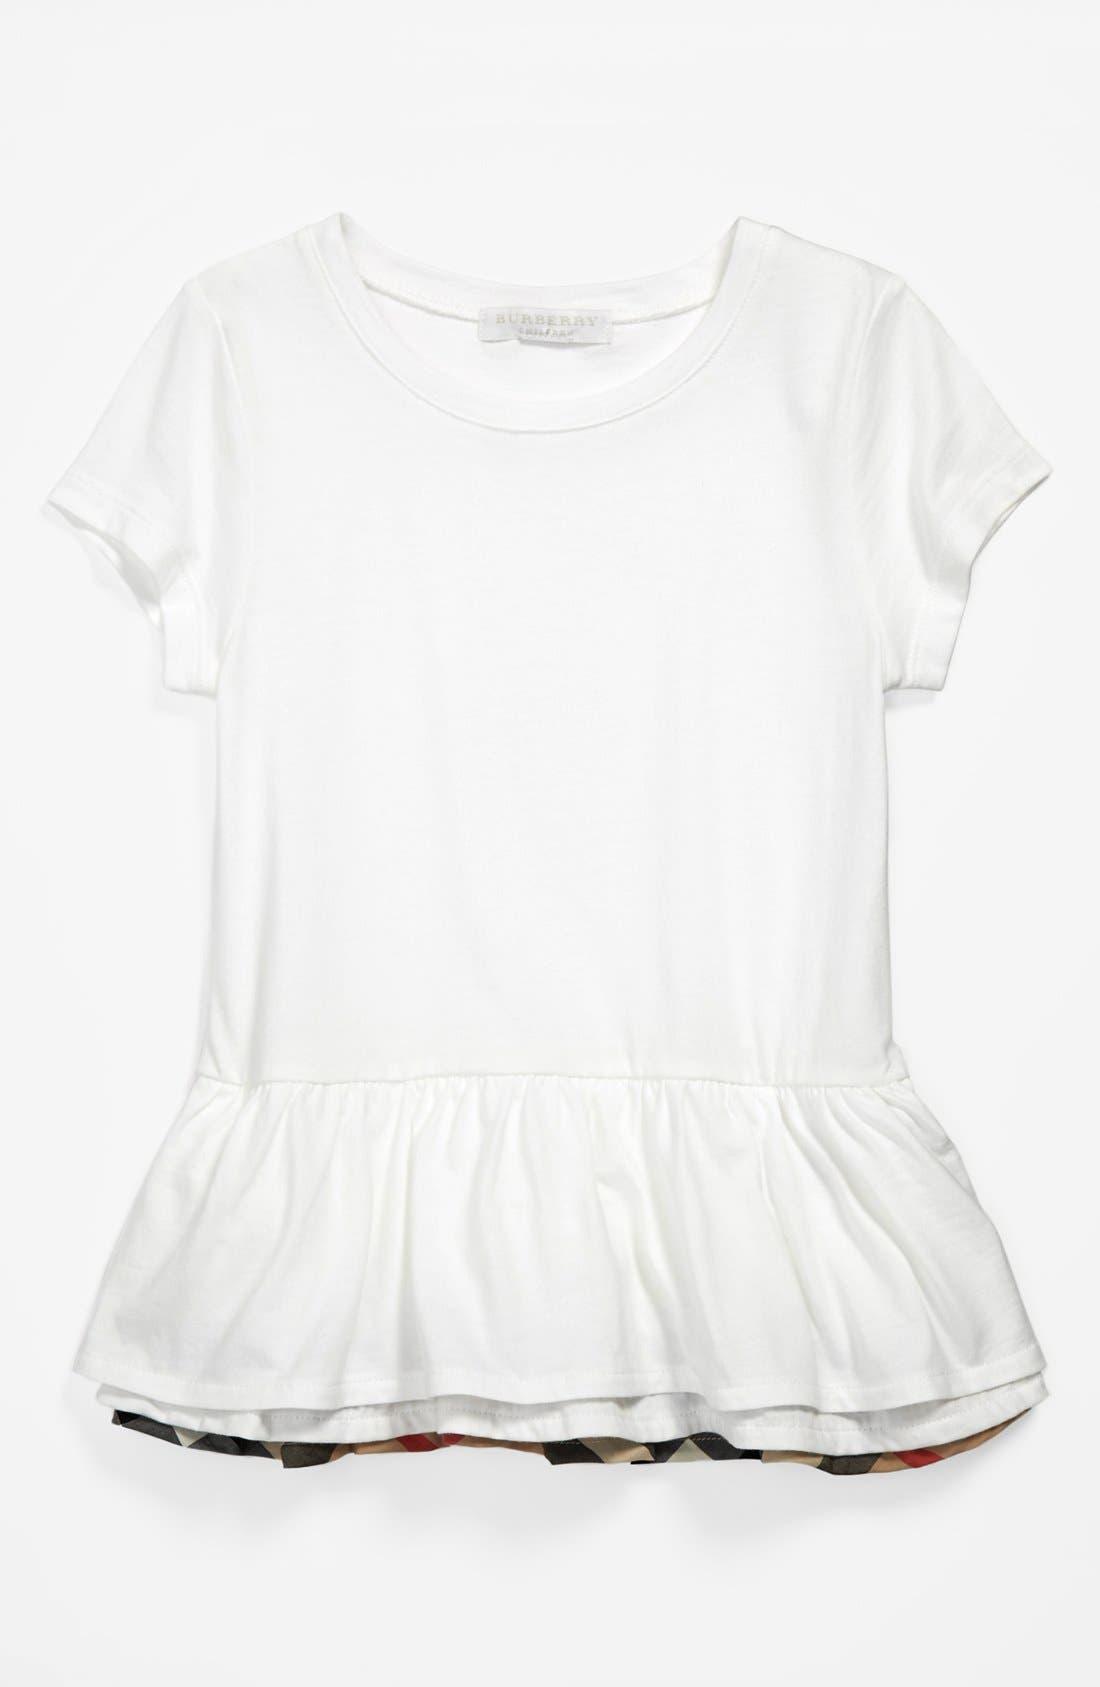 Main Image - Burberry 'Tyna' Tiered Ruffle Hem Top (Little Girls & Big Girls)